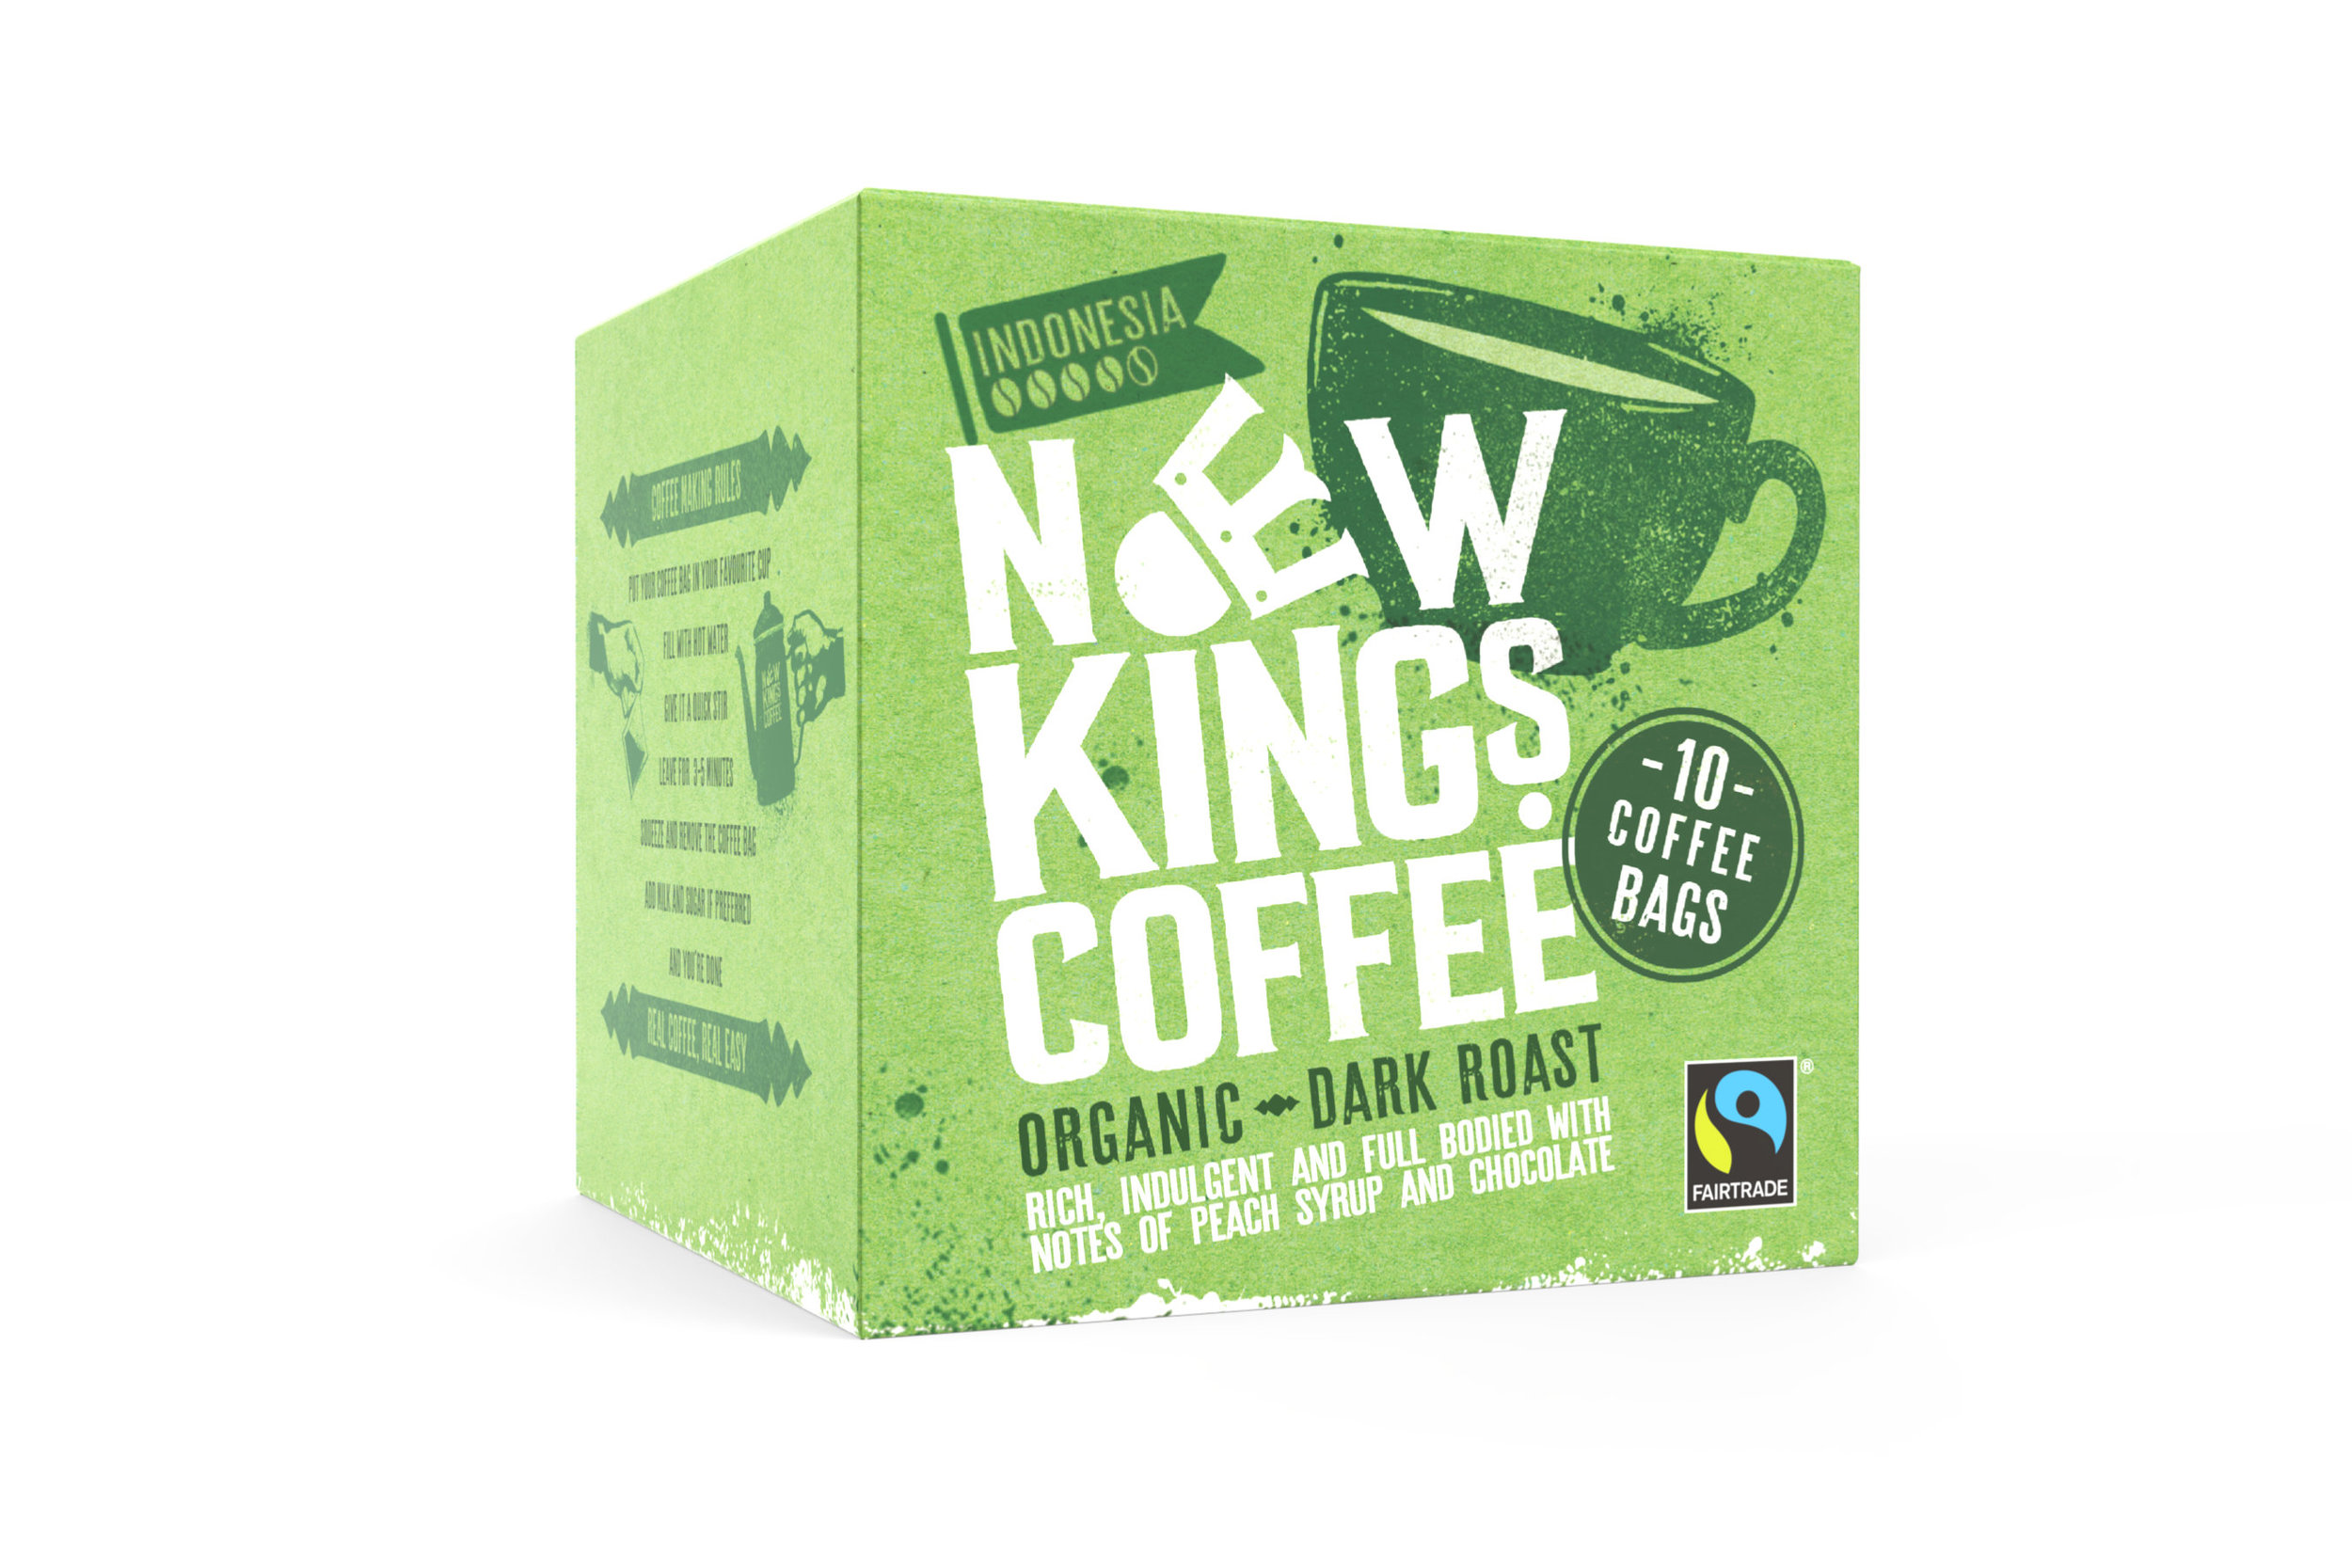 New-Kings-Coffee-Bags-Fairtrade-Organic-Indonesia-Dark-Roast-Front.jpg